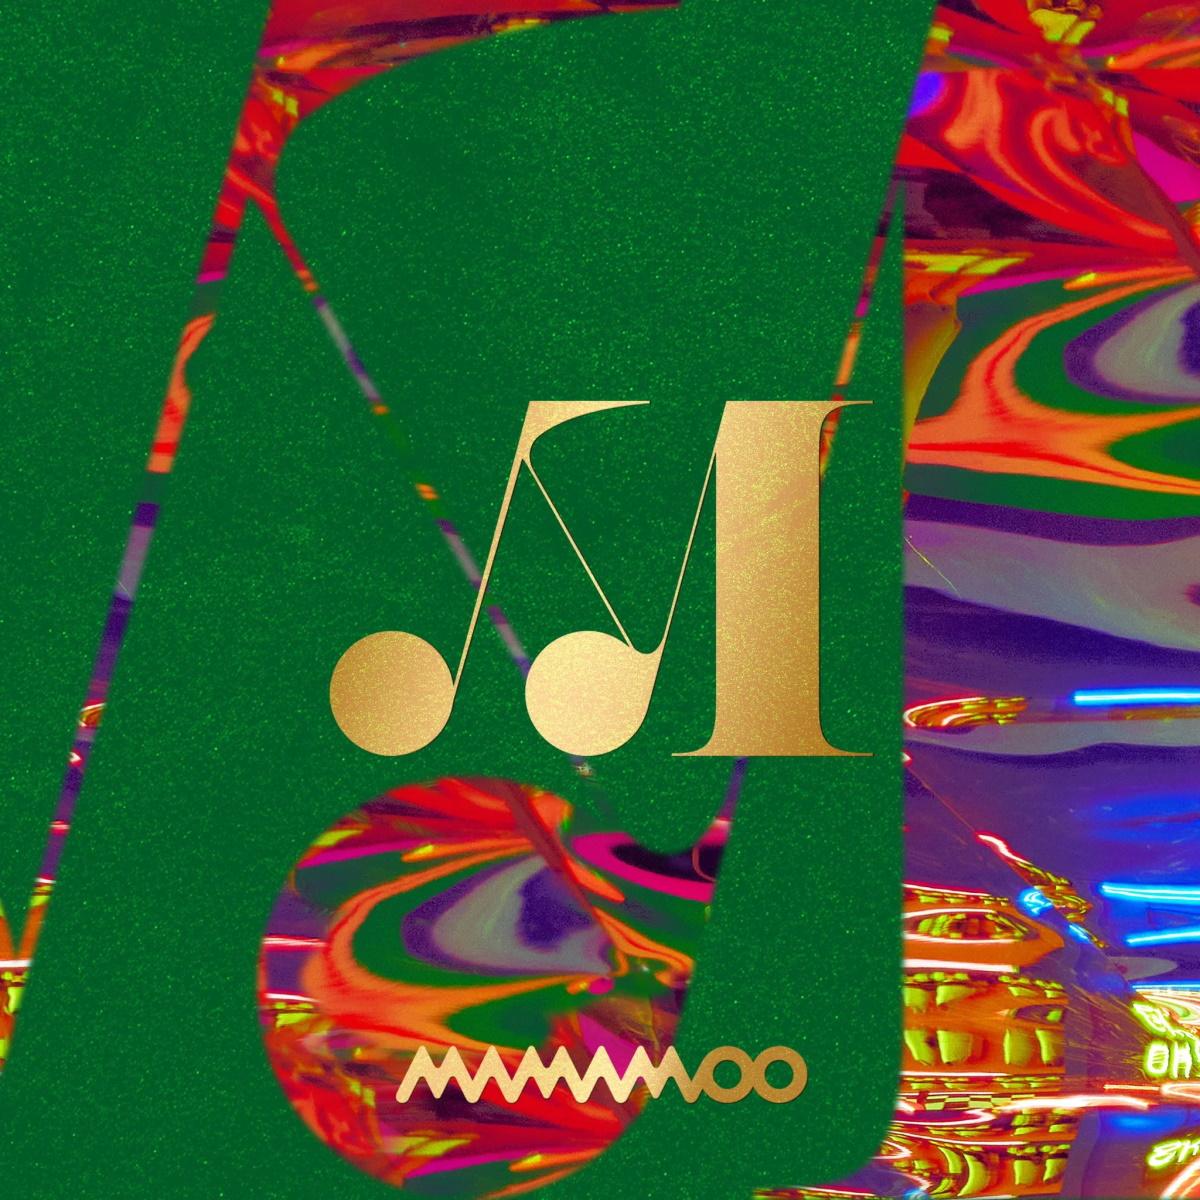 『MAMAMOO 딩가딩가 (Dingga) 歌詞』収録の『딩가딩가 (Dingga)』ジャケット